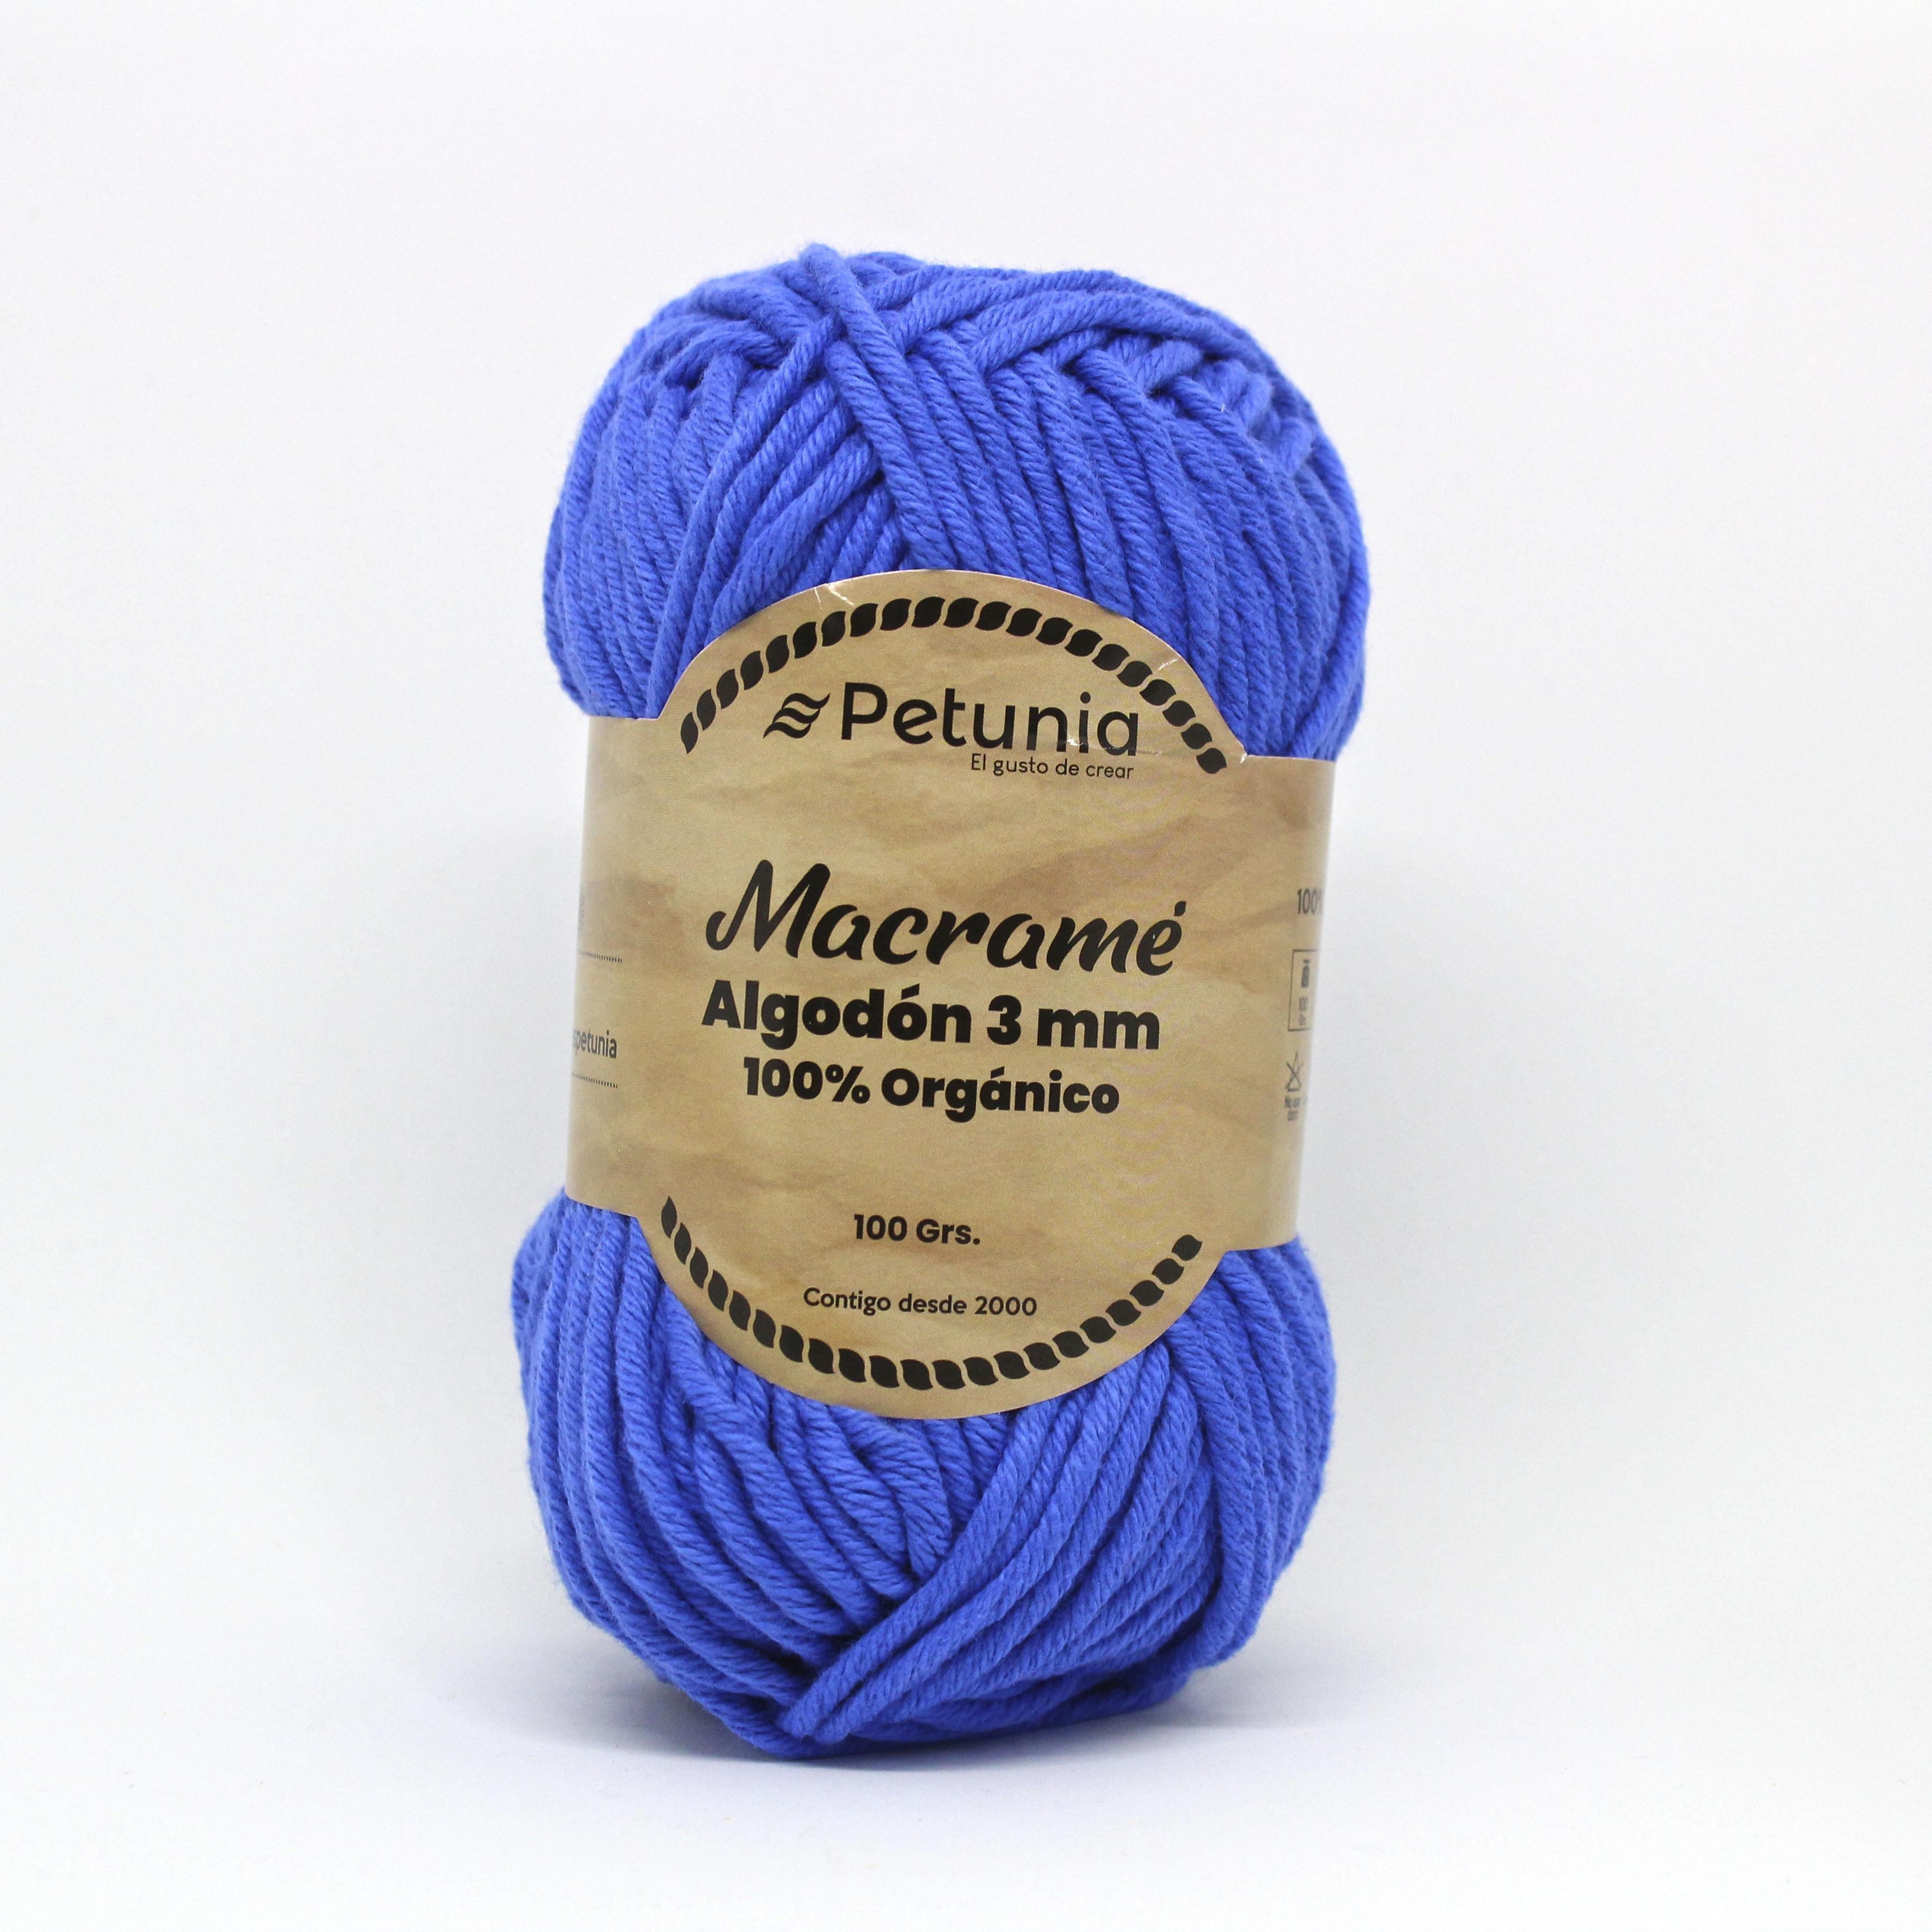 MACRAME ALGODON 3 MM - 6014